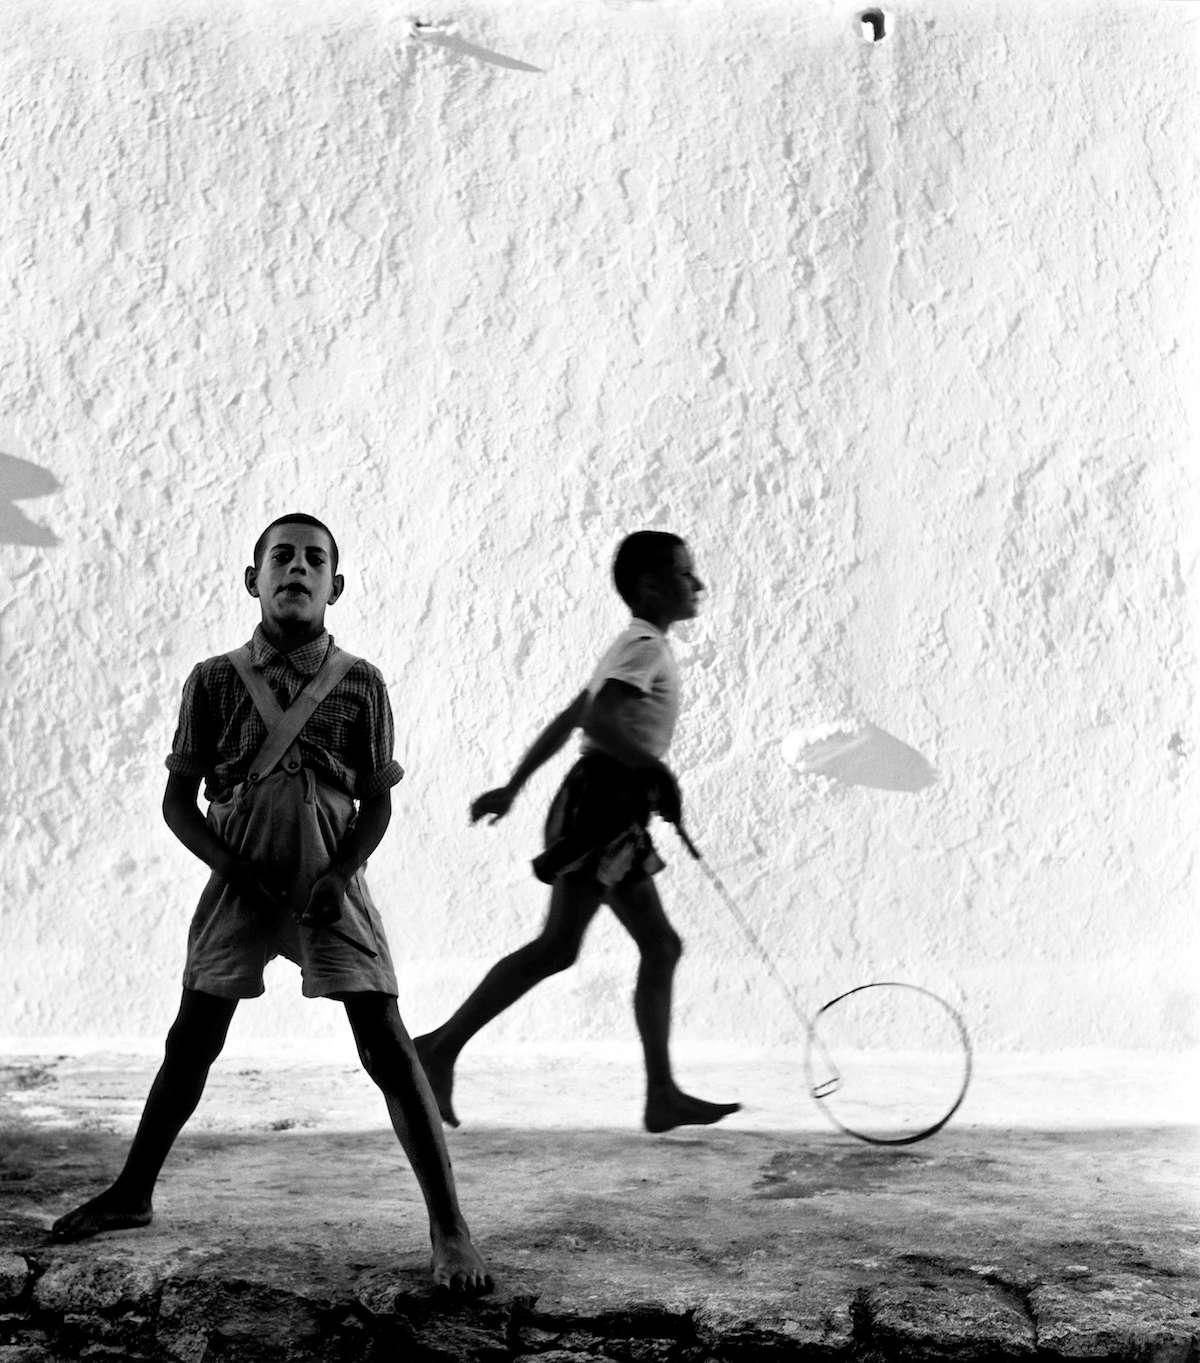 Piergiorgio Branzi documentary photography